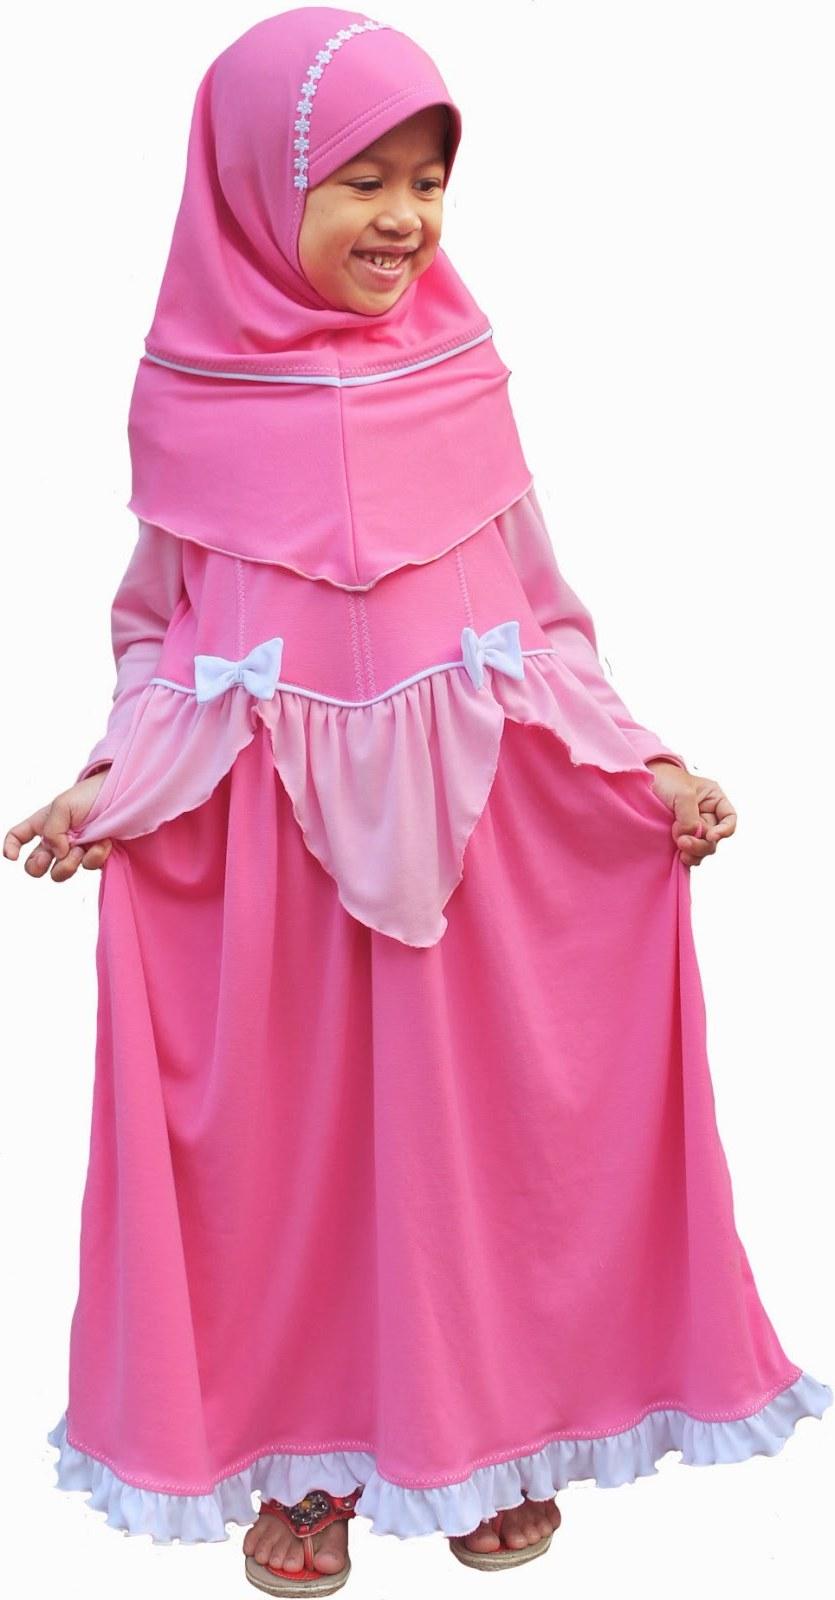 Design Model Baju Lebaran Anak Perempuan Dddy Model Baju Muslim Anak Perempuan